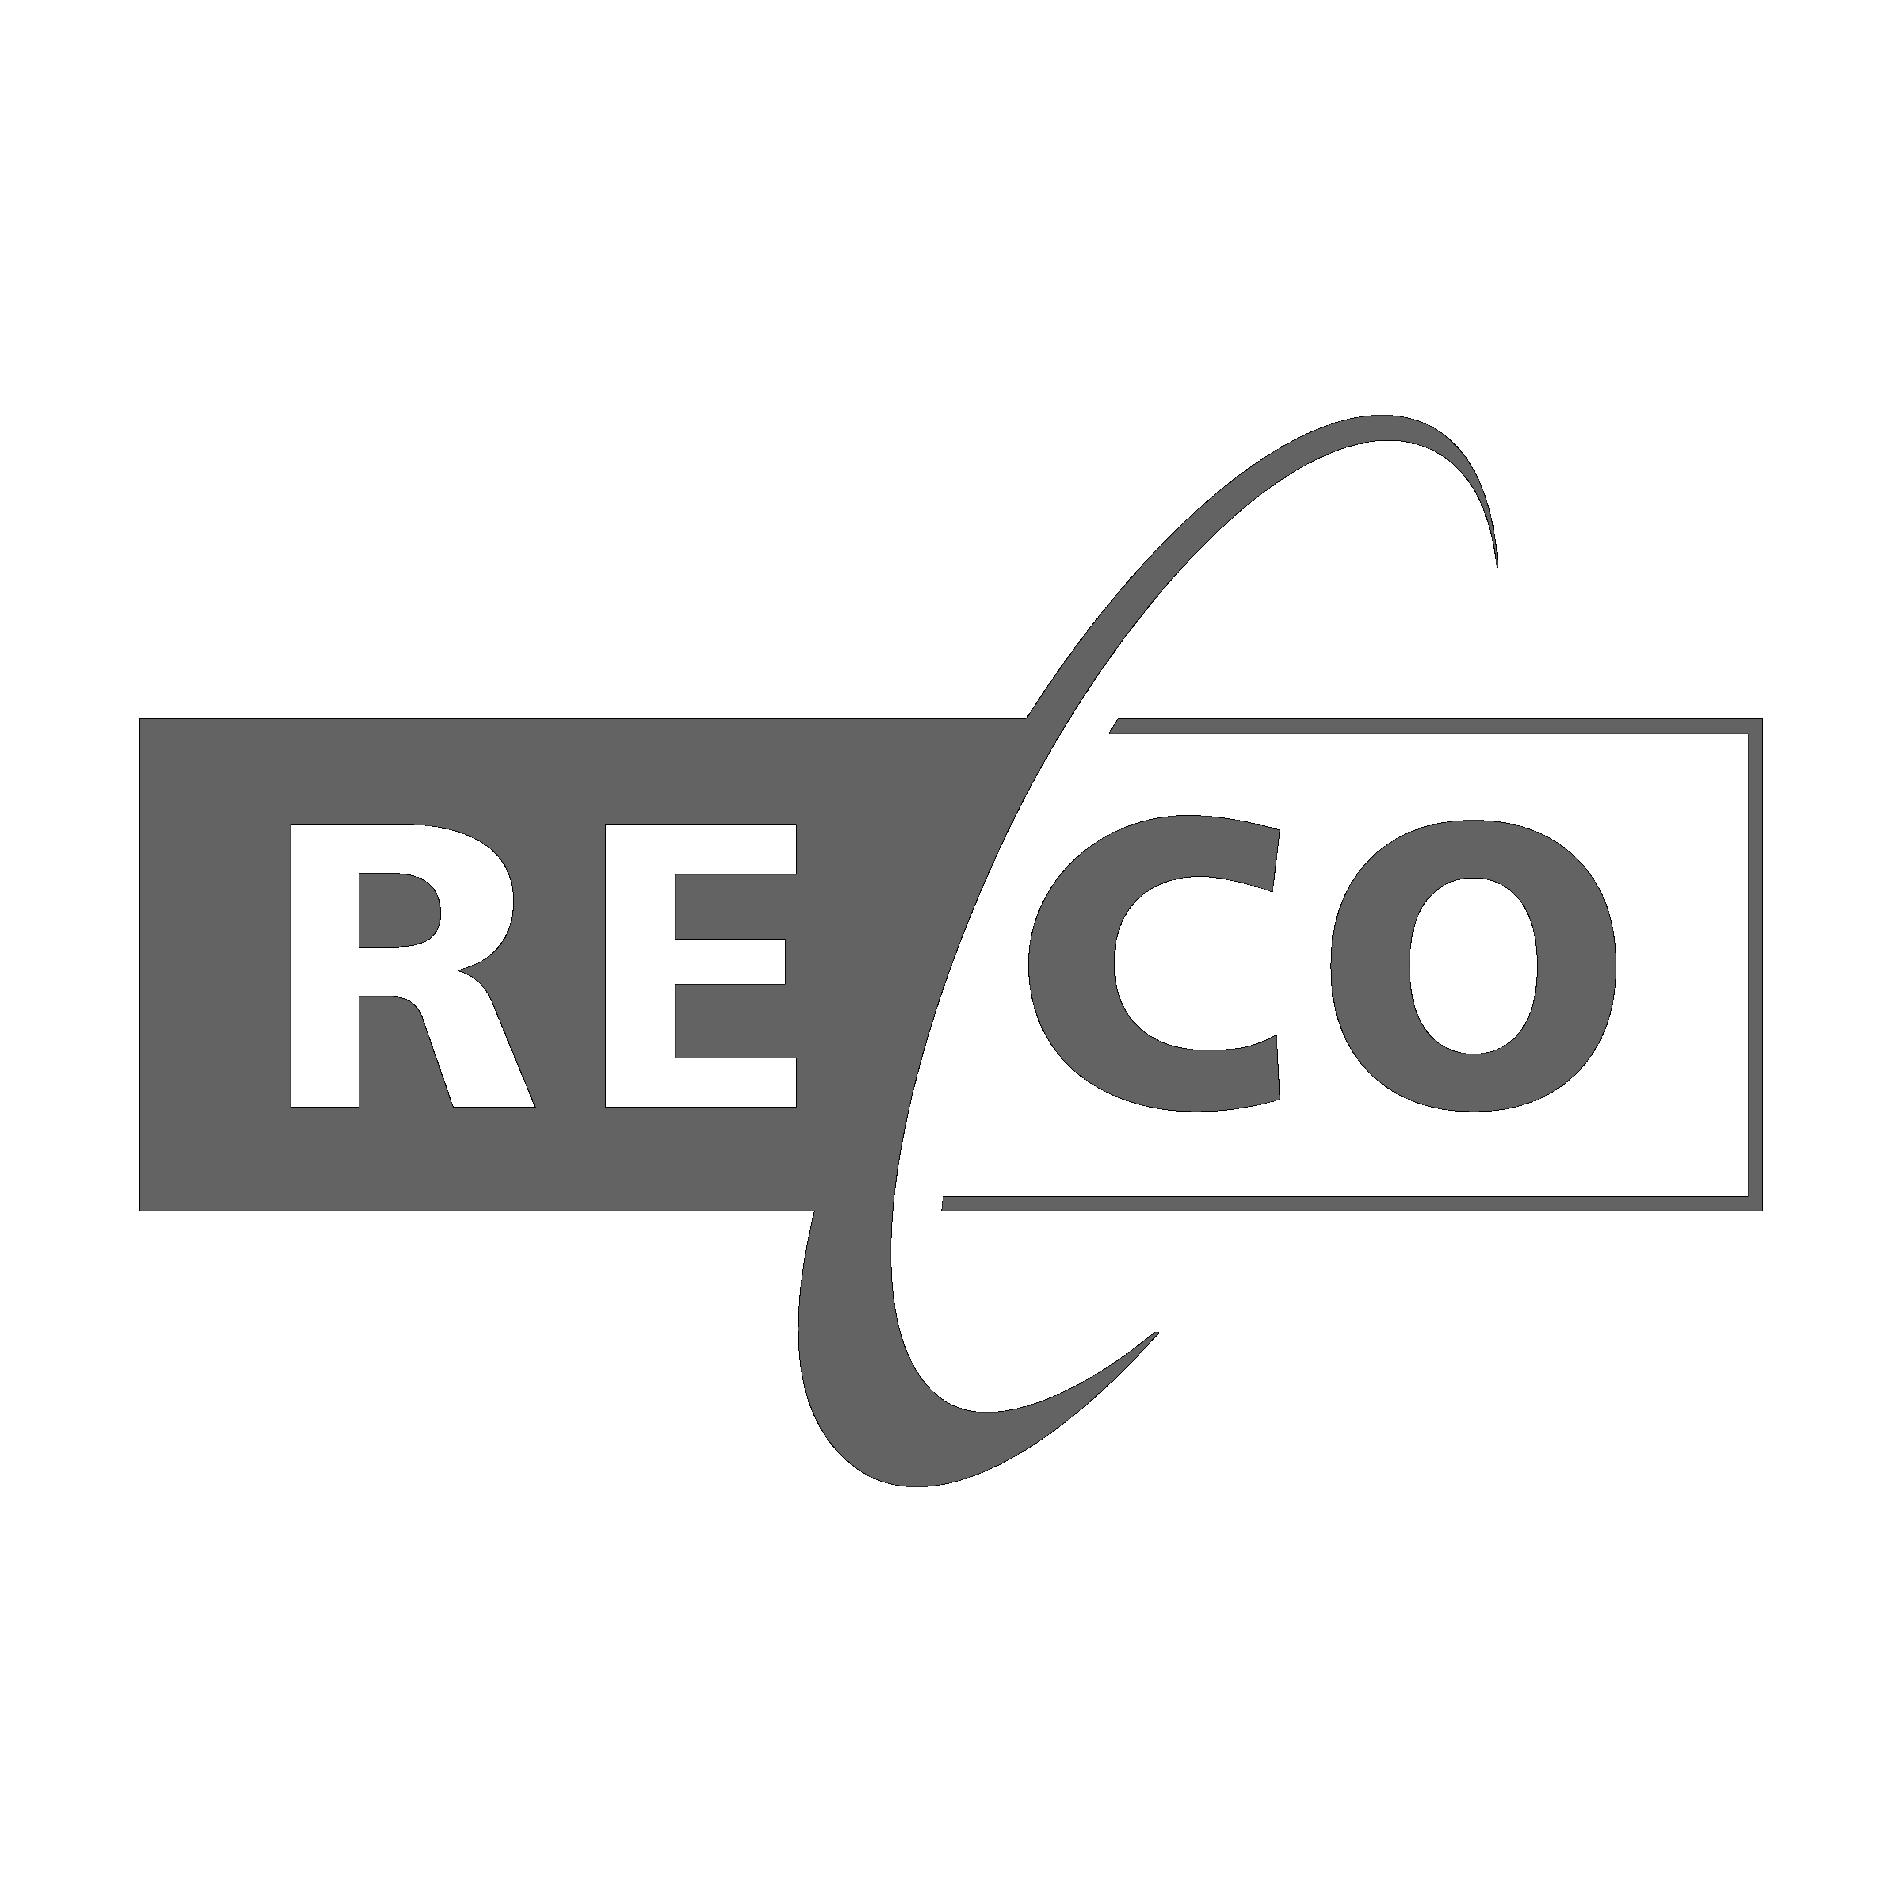 reco-logo-png-transparent-BW